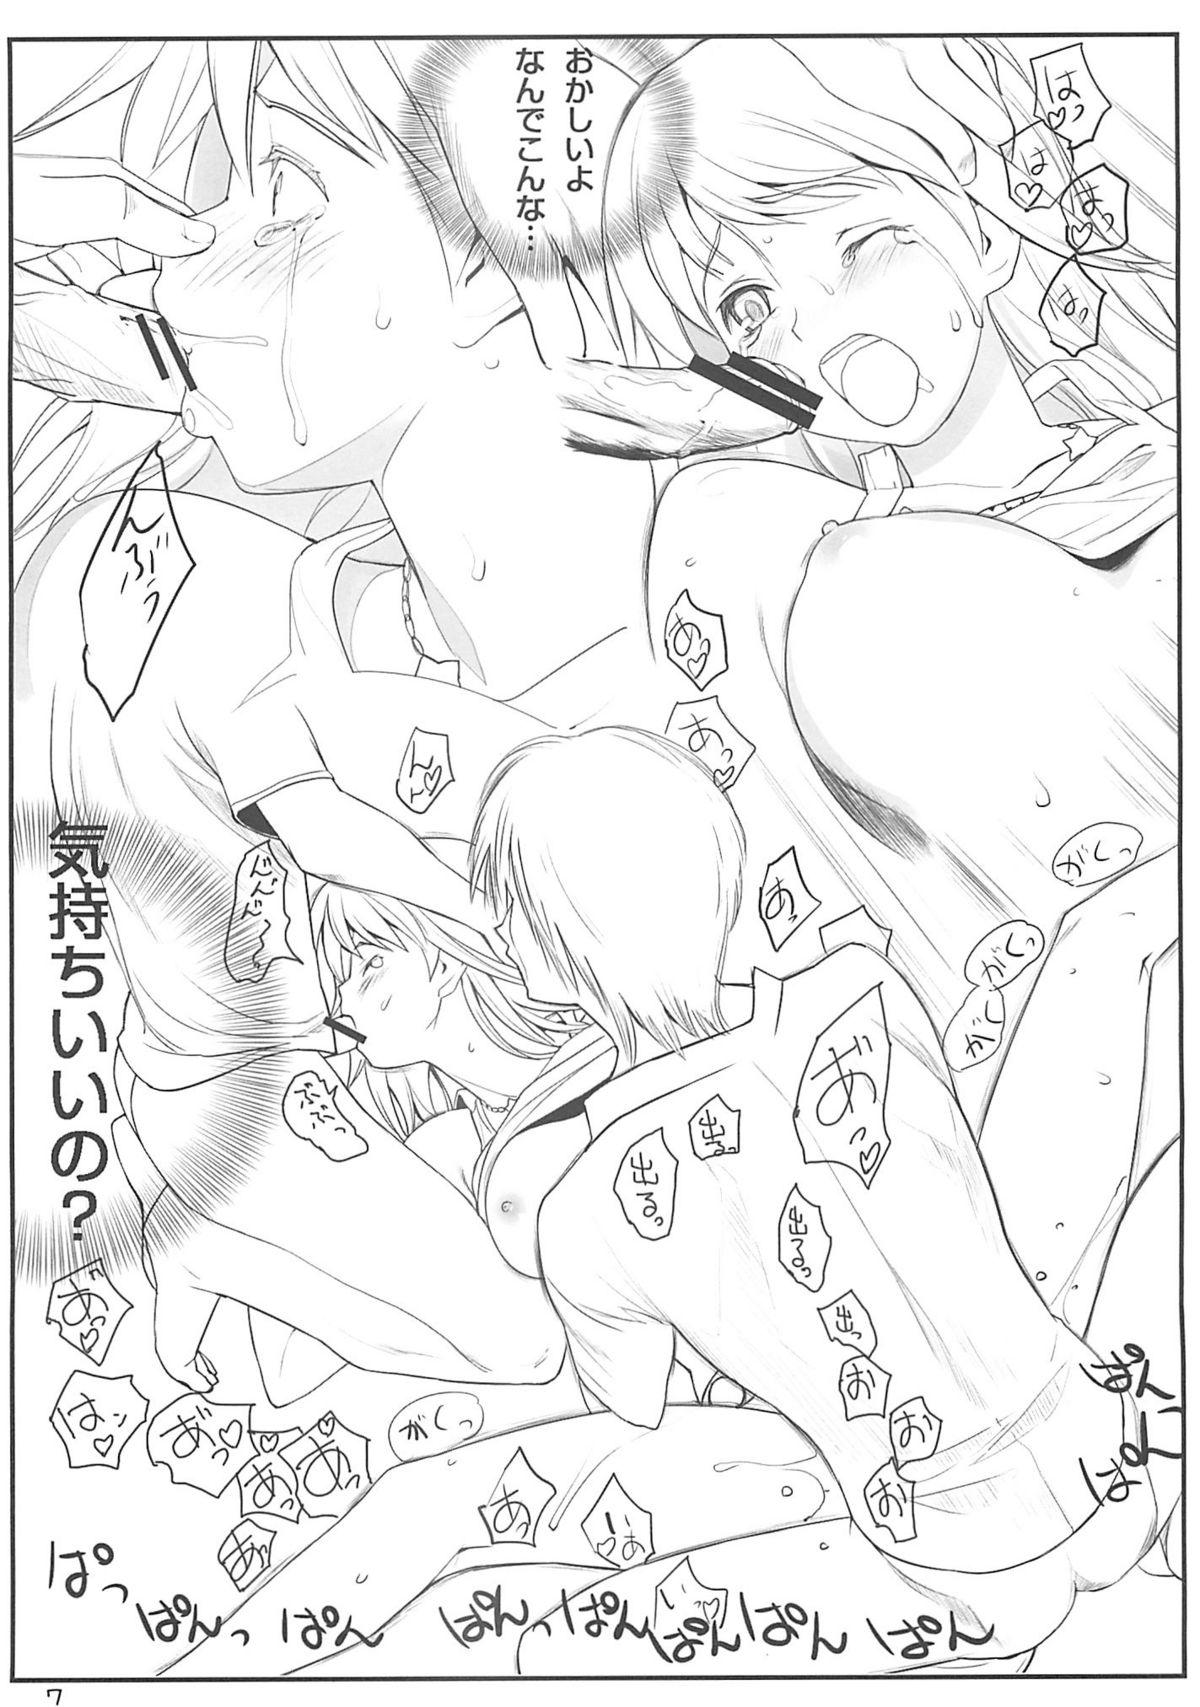 Enikki Recycle 8 no Omake Hon - Dossamagi! 6